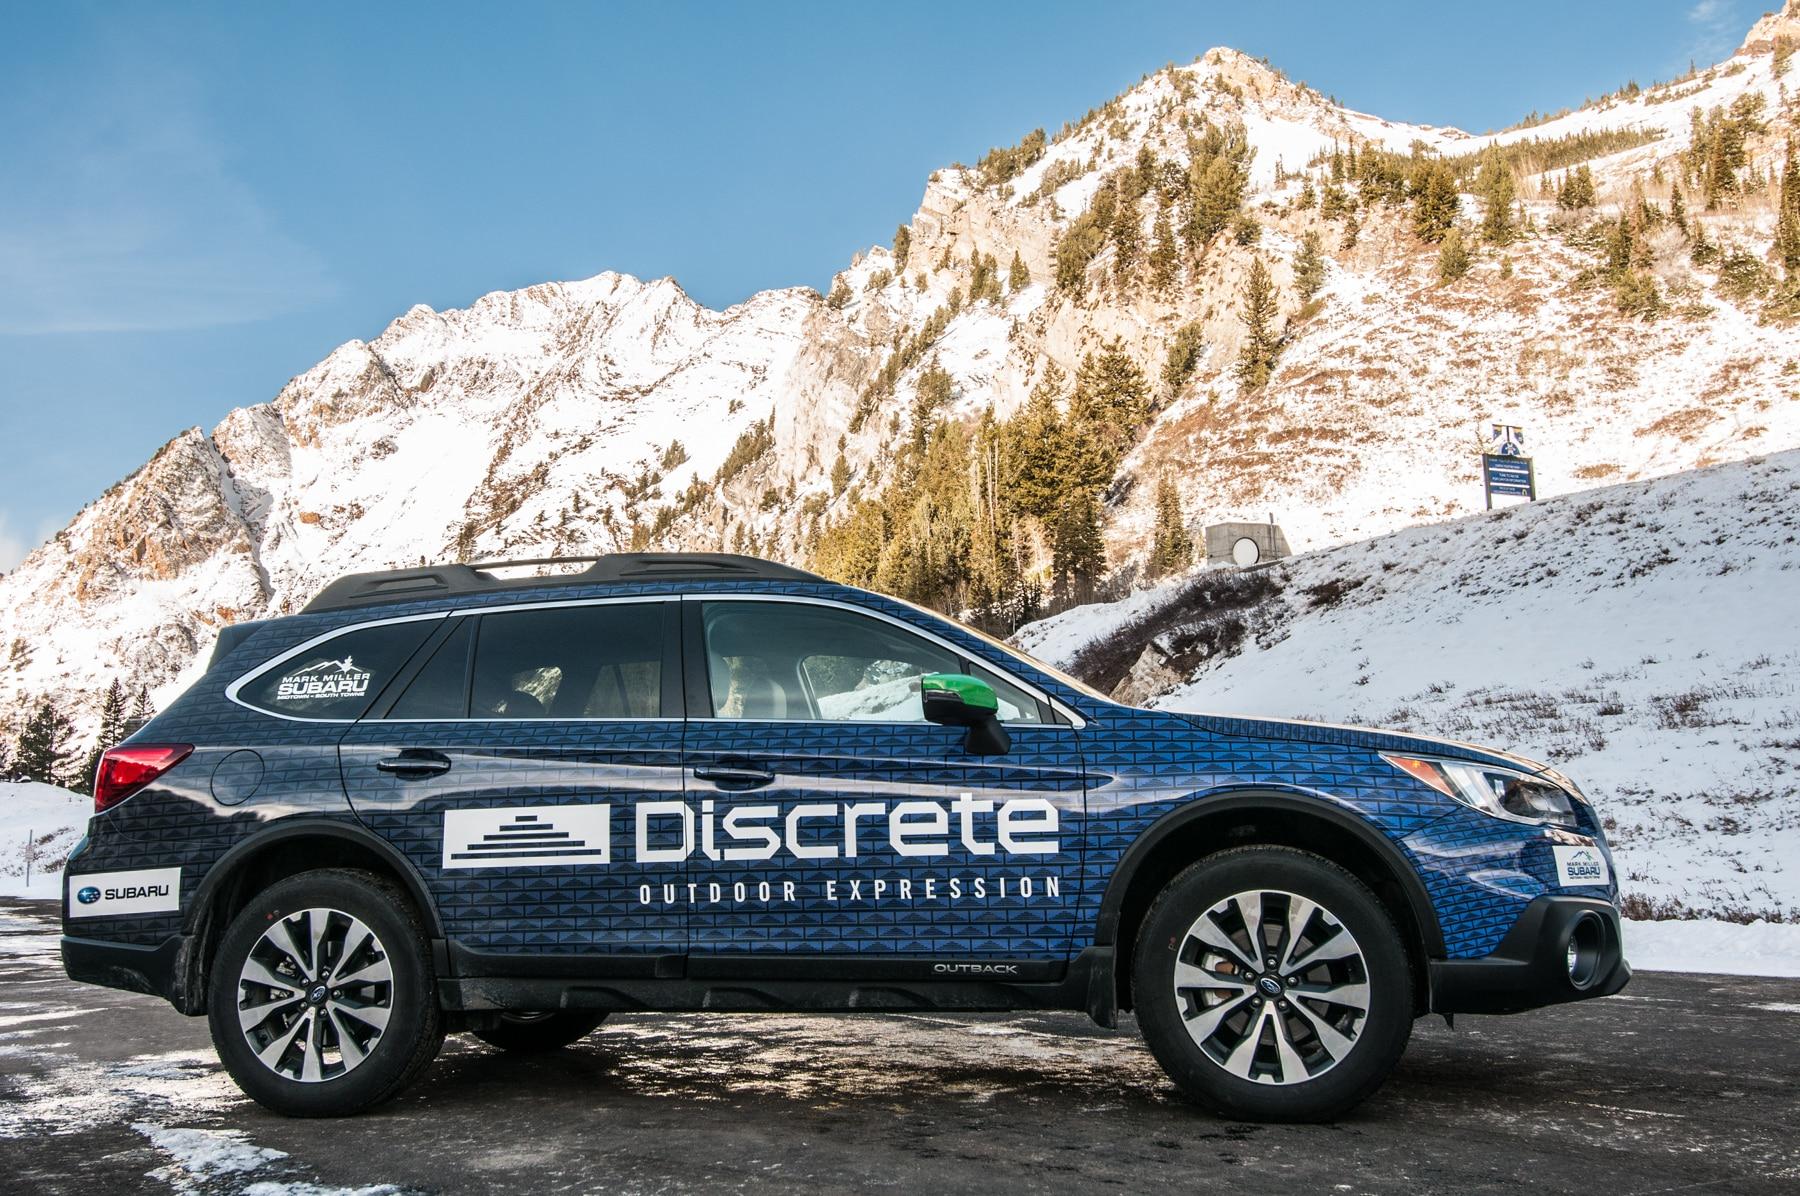 Mark Miller Subaru Southtowne >> Mark Miller Subaru Midtown | Our Partners